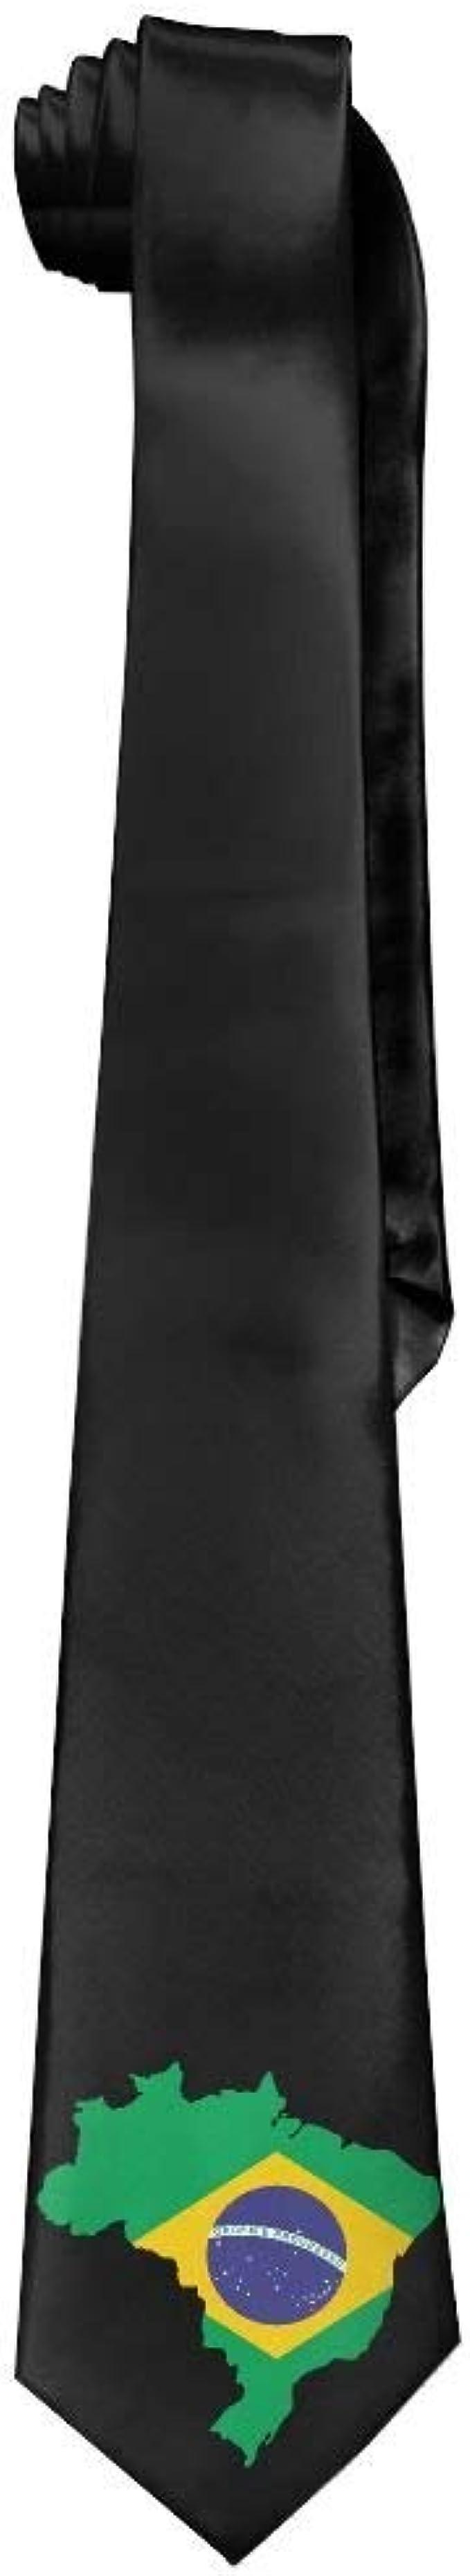 Jxrodekz Corbatas de seda clásicas negras para hombre de Brasil ...